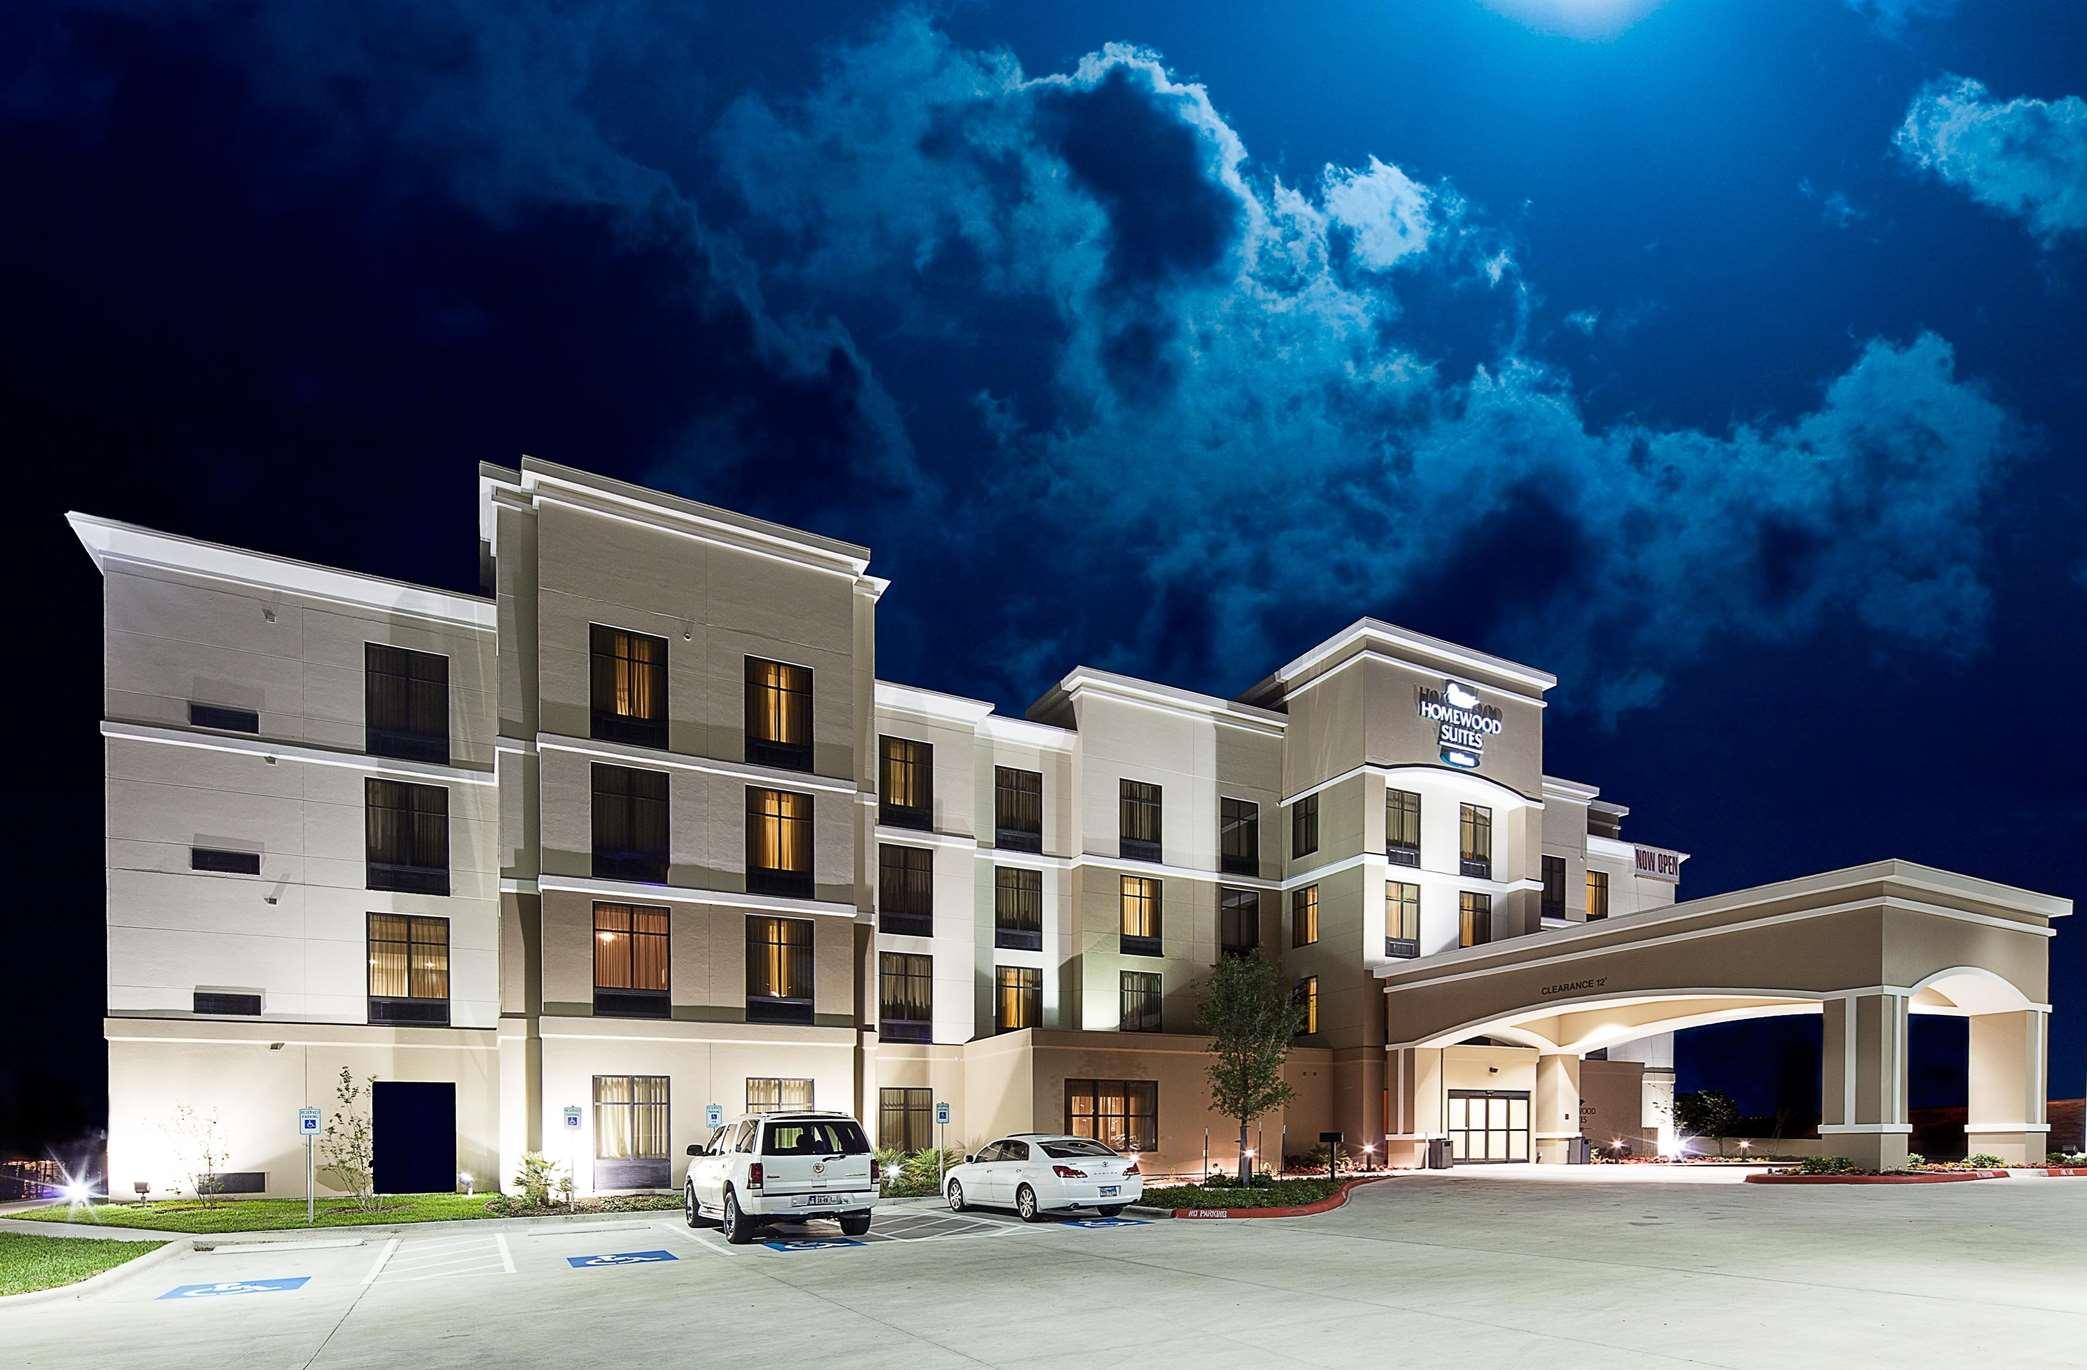 Homewood Suites by Hilton Victoria, TX image 0